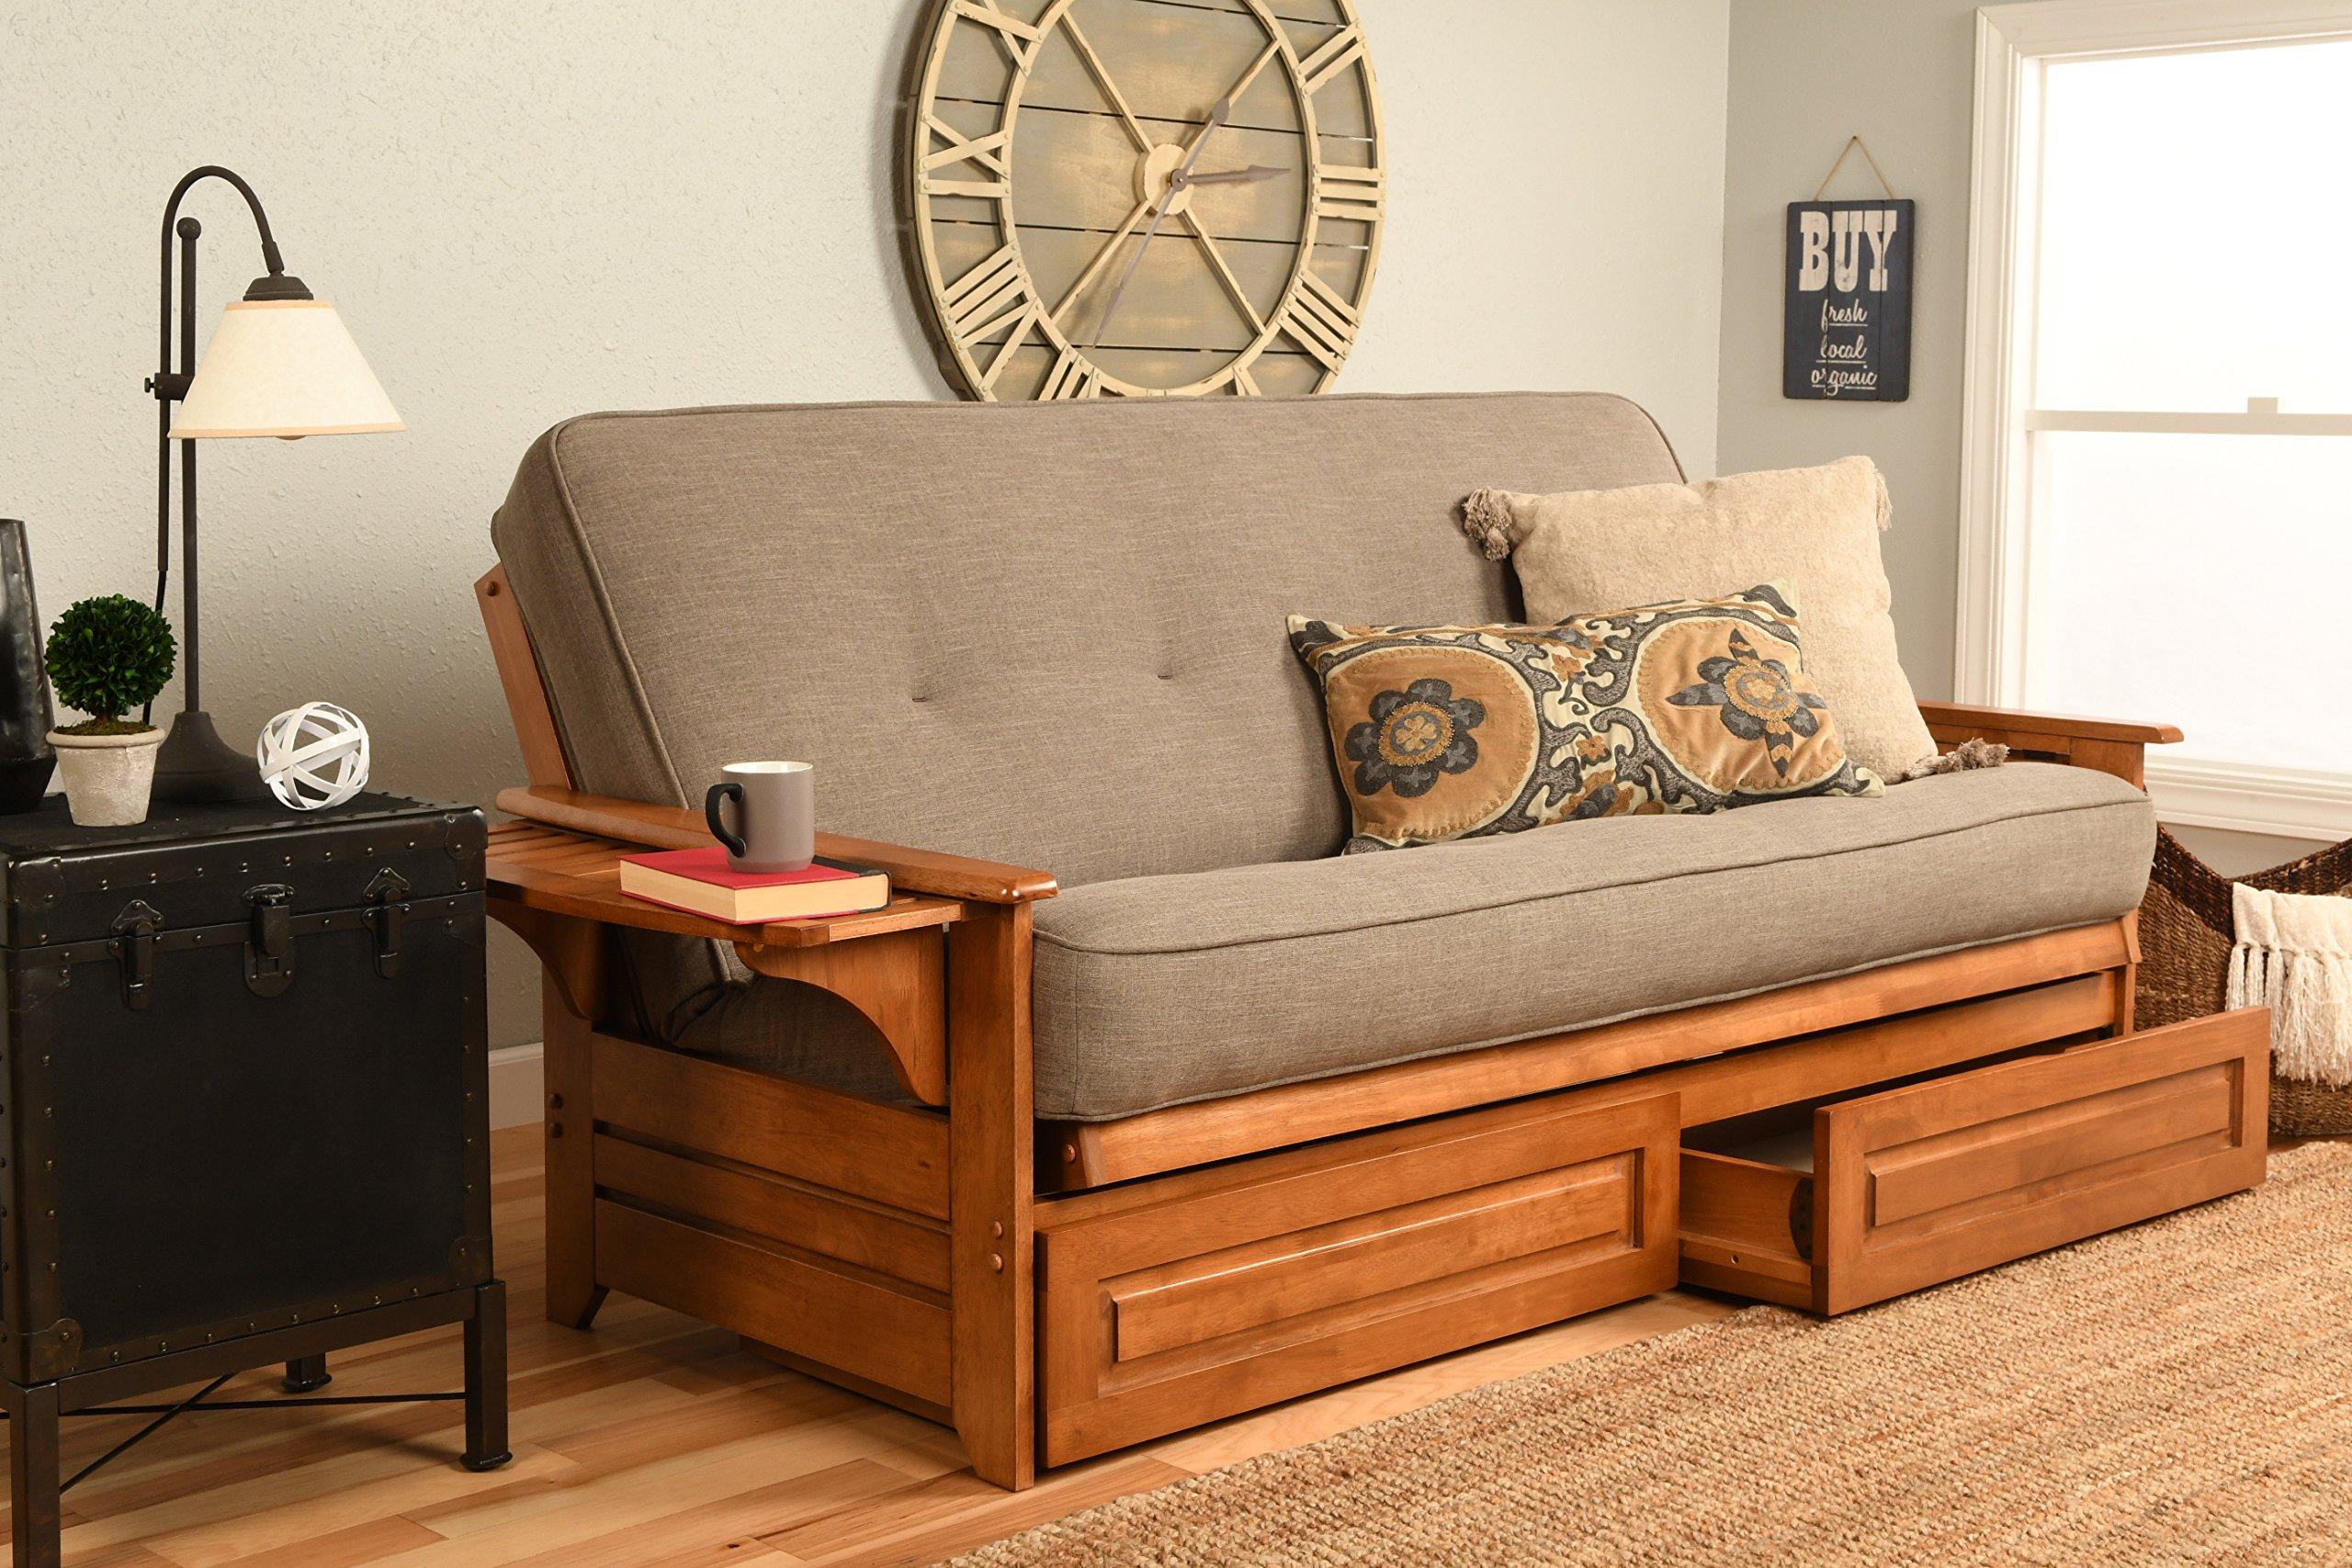 Kodiak Furniture Phoenix Futon Set with Linen Stone Mattress and Storage Drawers, Full, Barbados by Kodiak Furniture